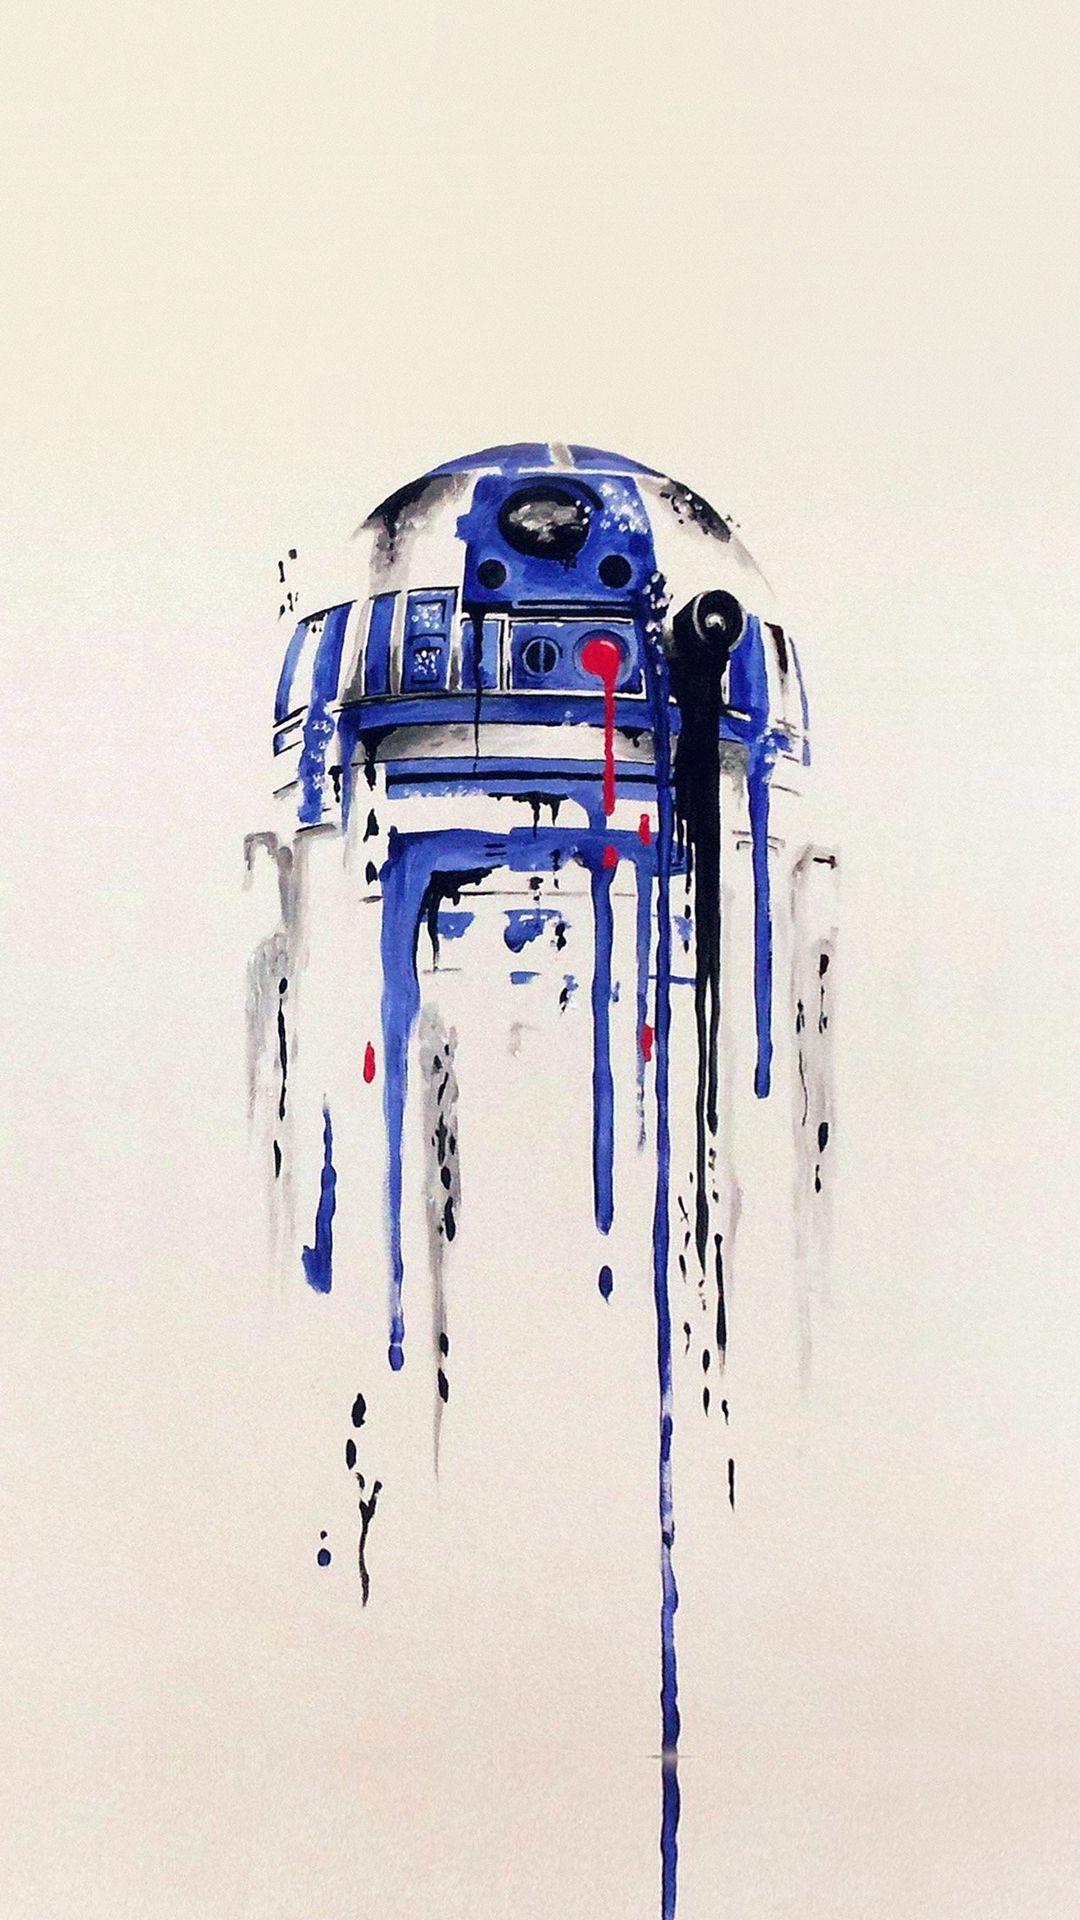 Iphone 8 Wallpaper Star Wars